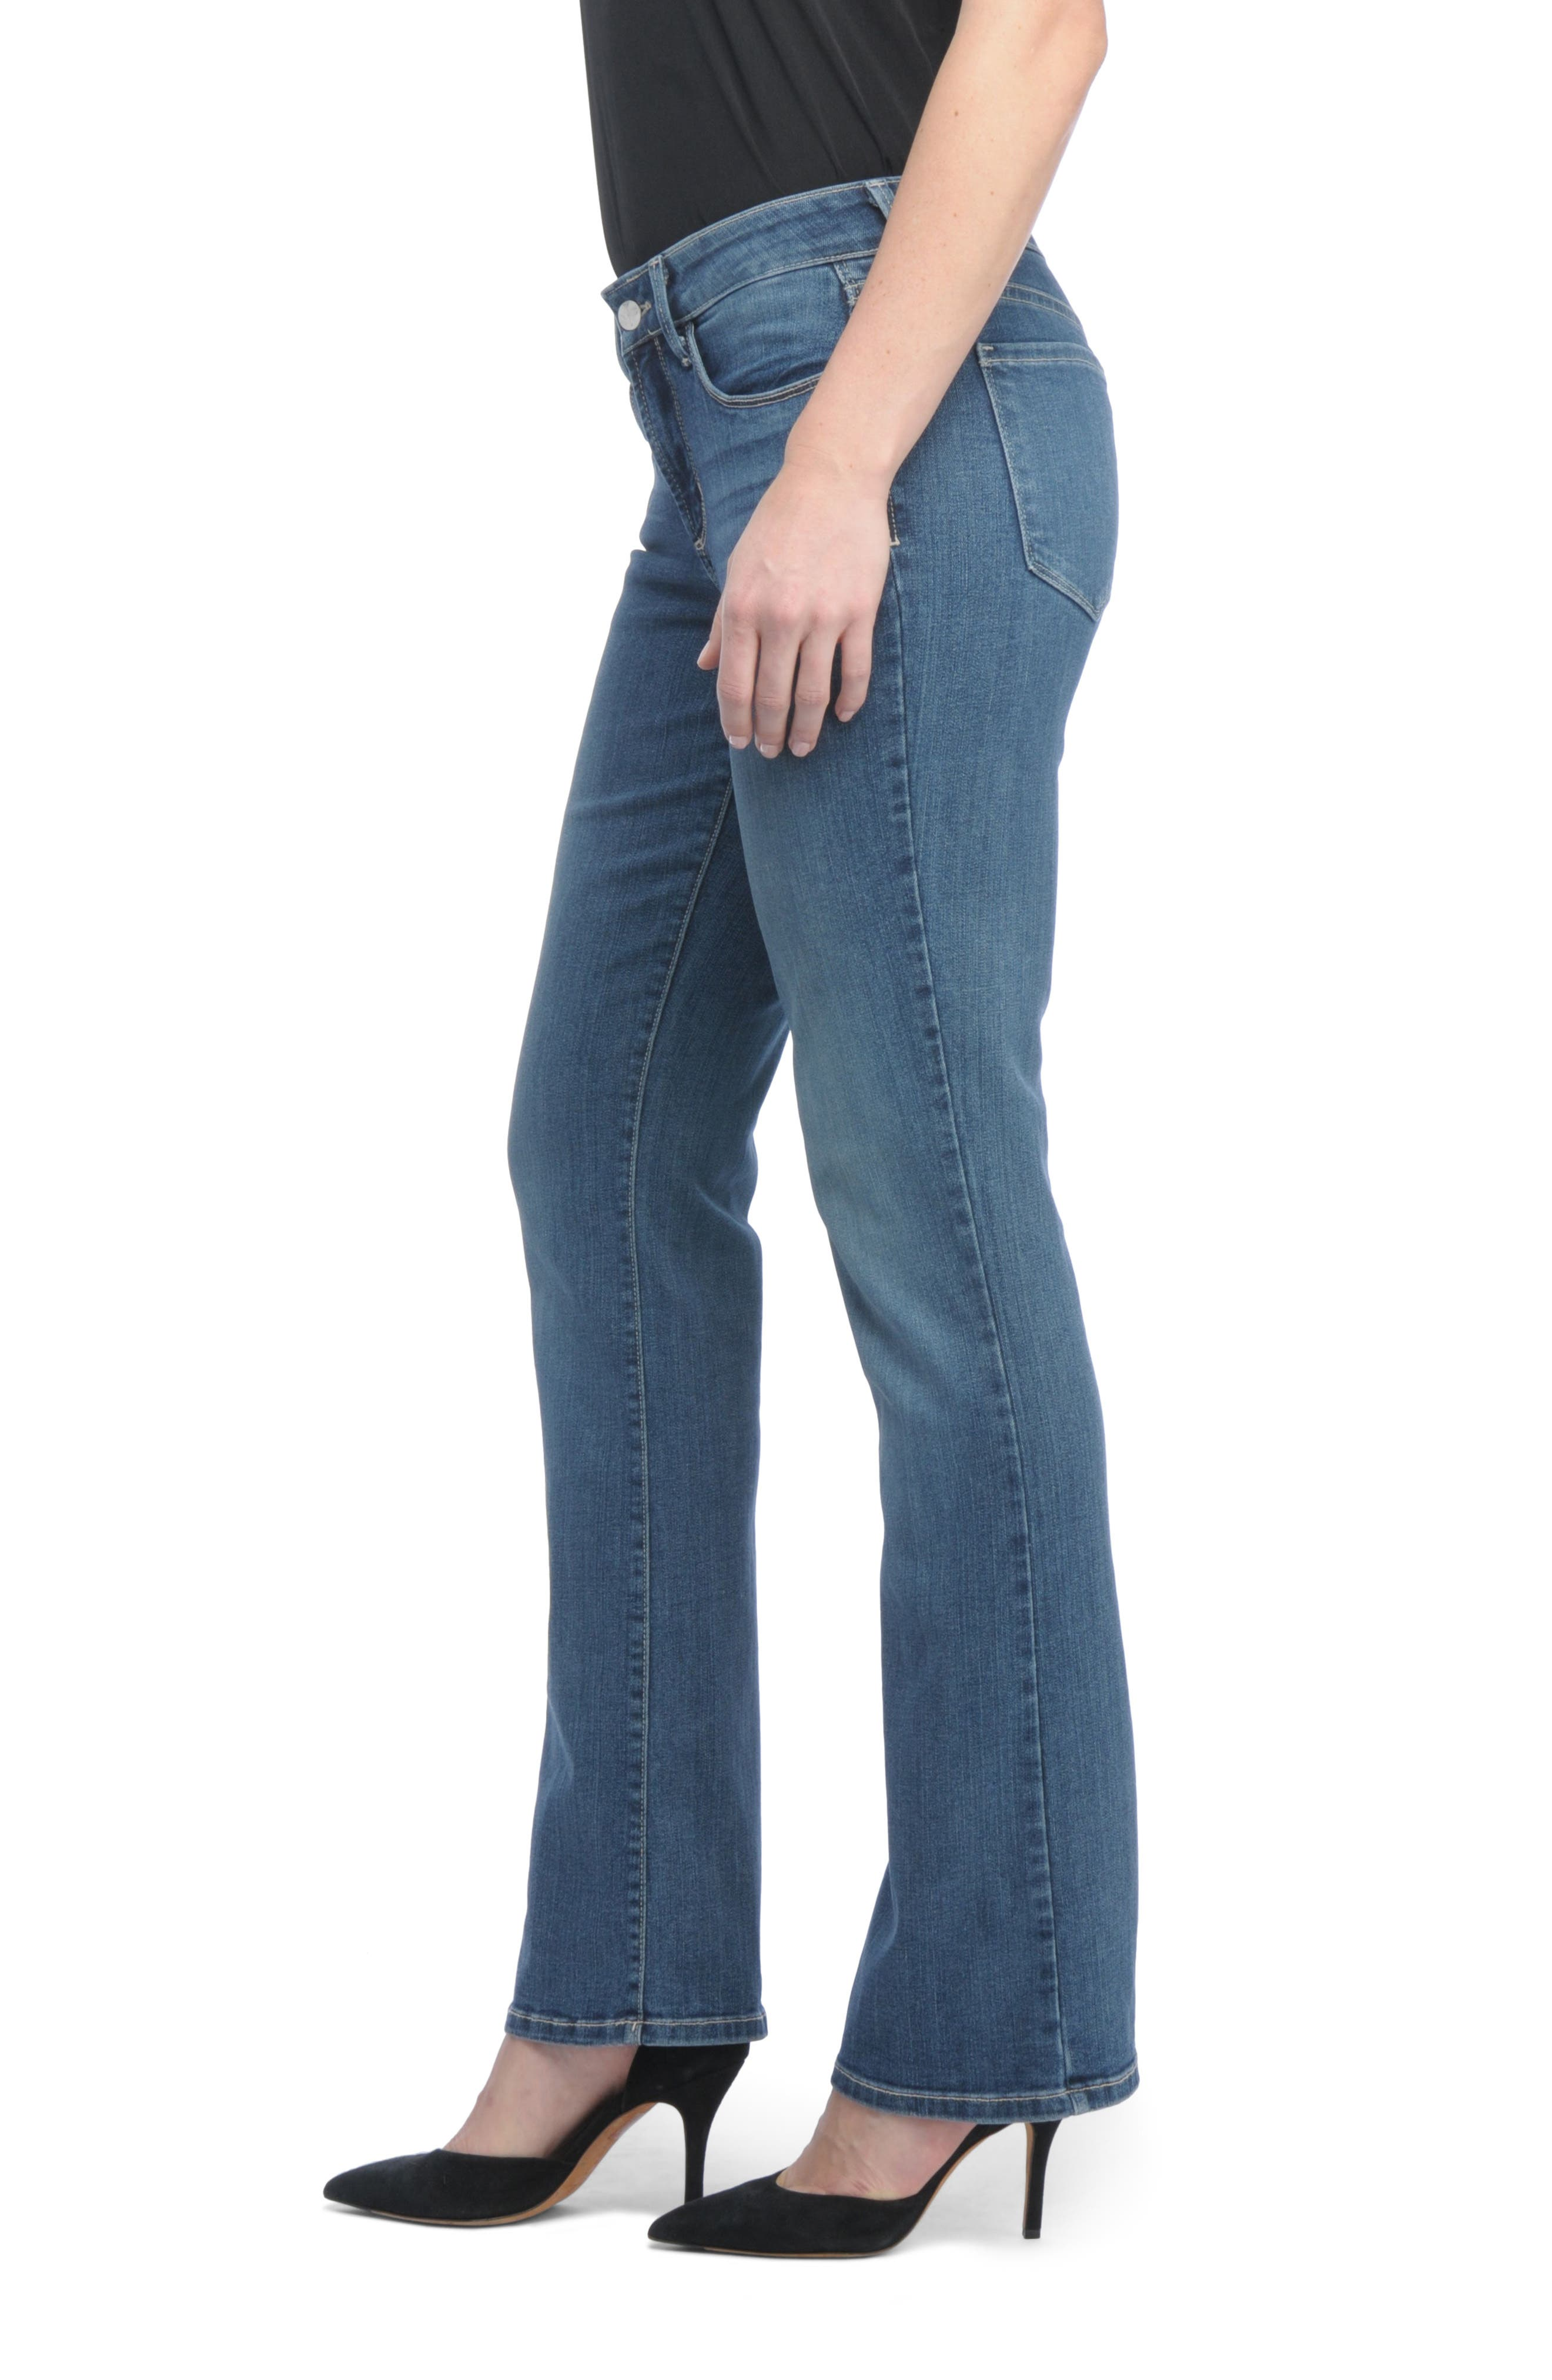 Barbara Bootcut Short Jeans,                             Alternate thumbnail 3, color,